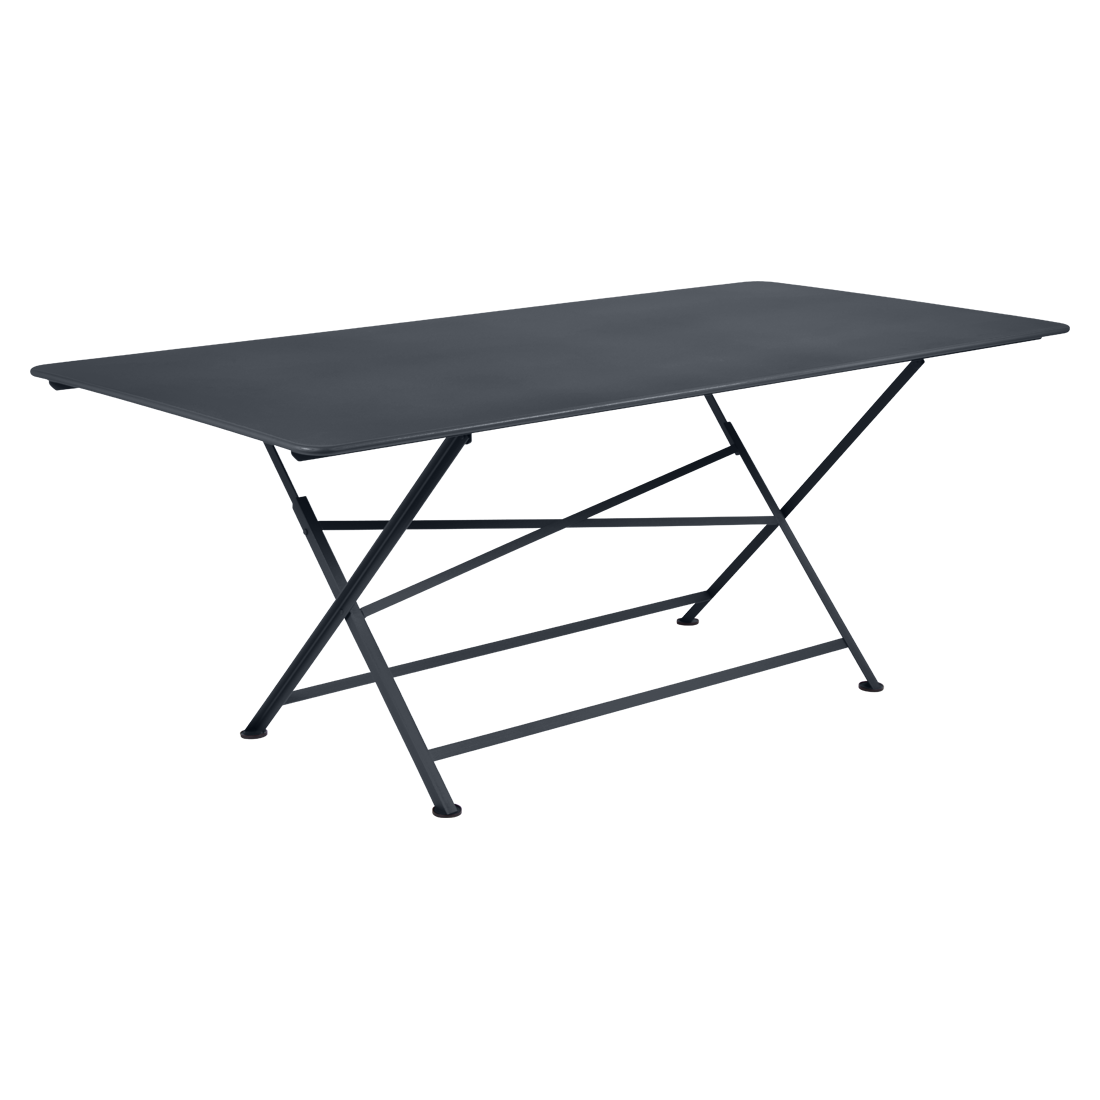 table de jardin, table metal, table de jardin pliante, table metal pliante, table fermob noir